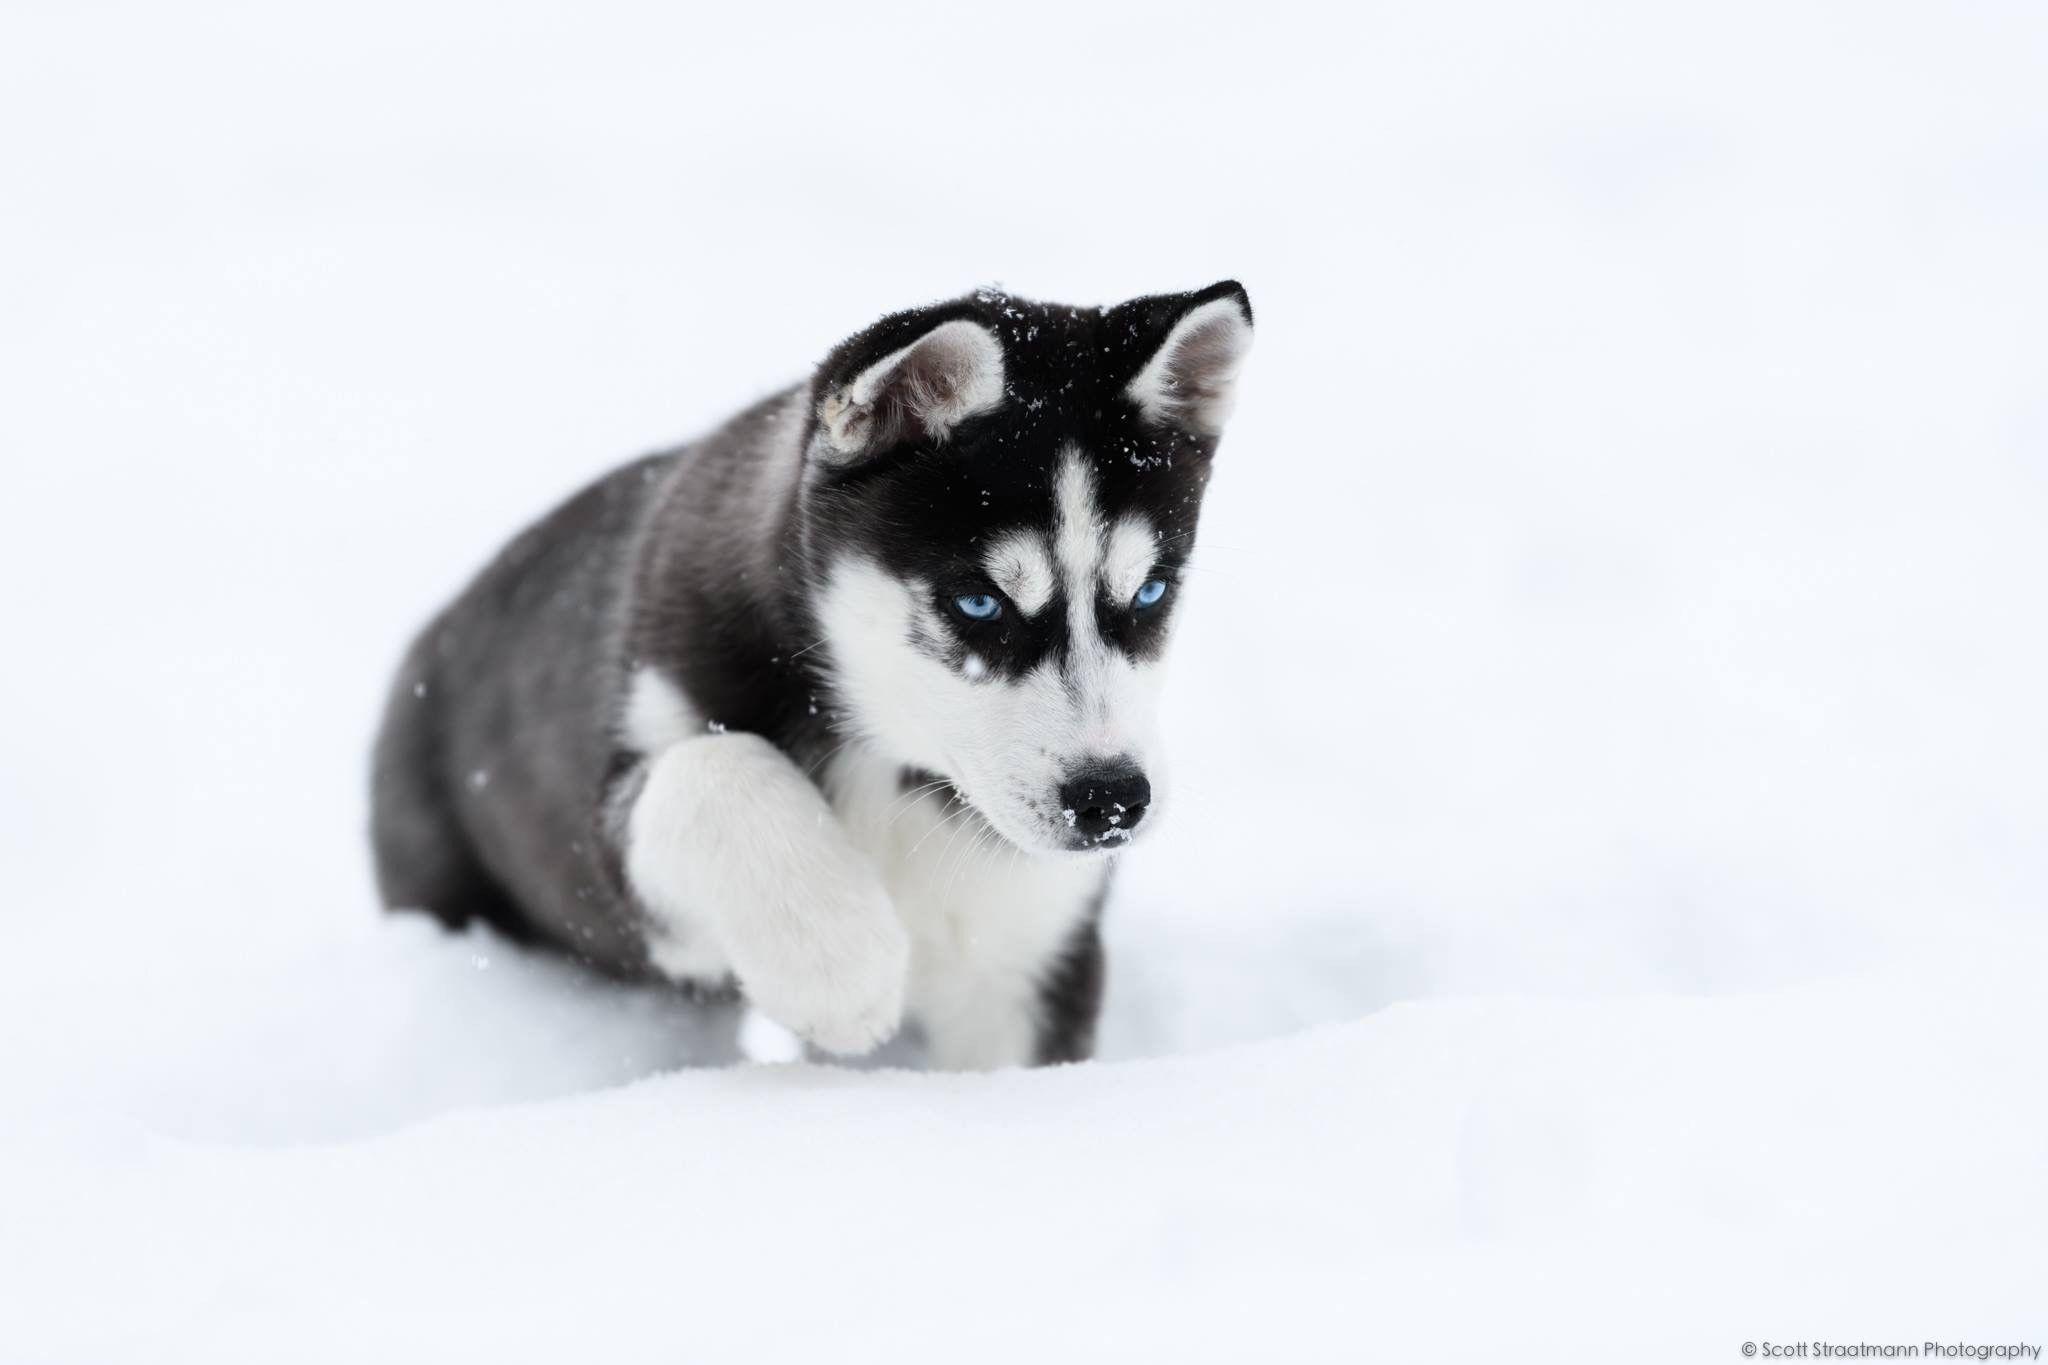 Husky Puppy Playing In Snow Husky Siberian Husky Husky Puppy